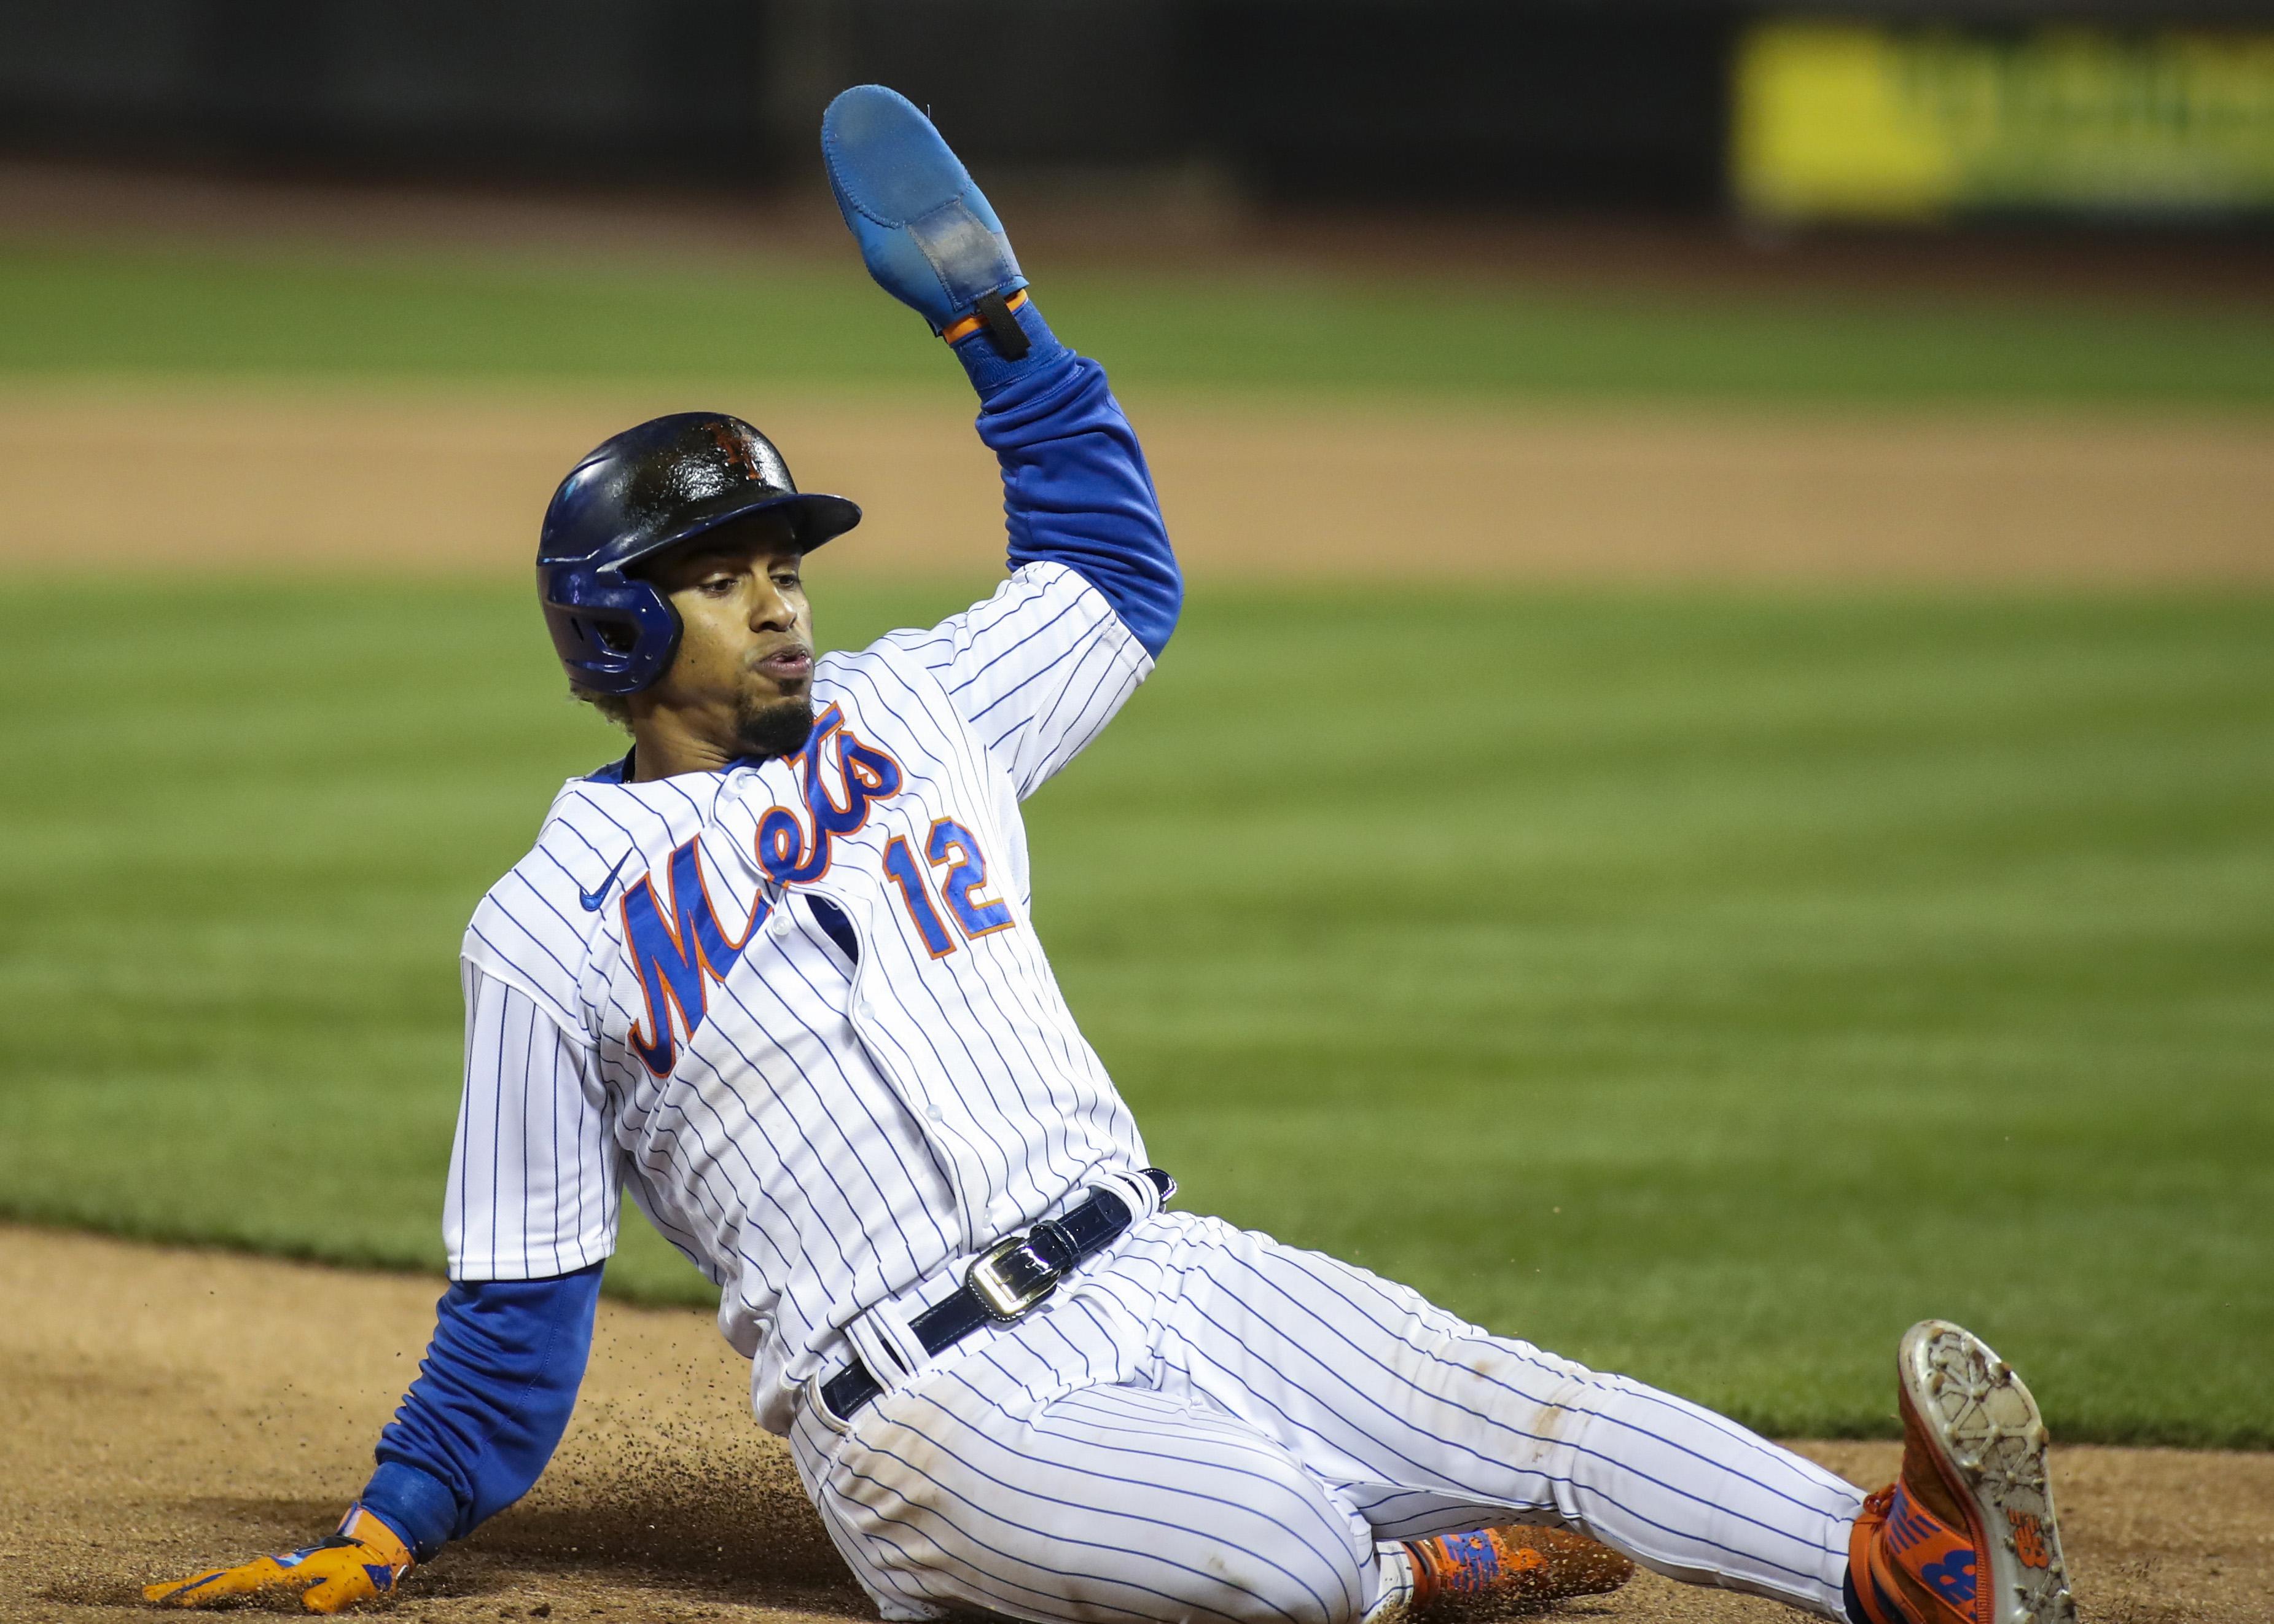 5/31/21 Game Preview: New York Mets at Arizona Diamondbacks